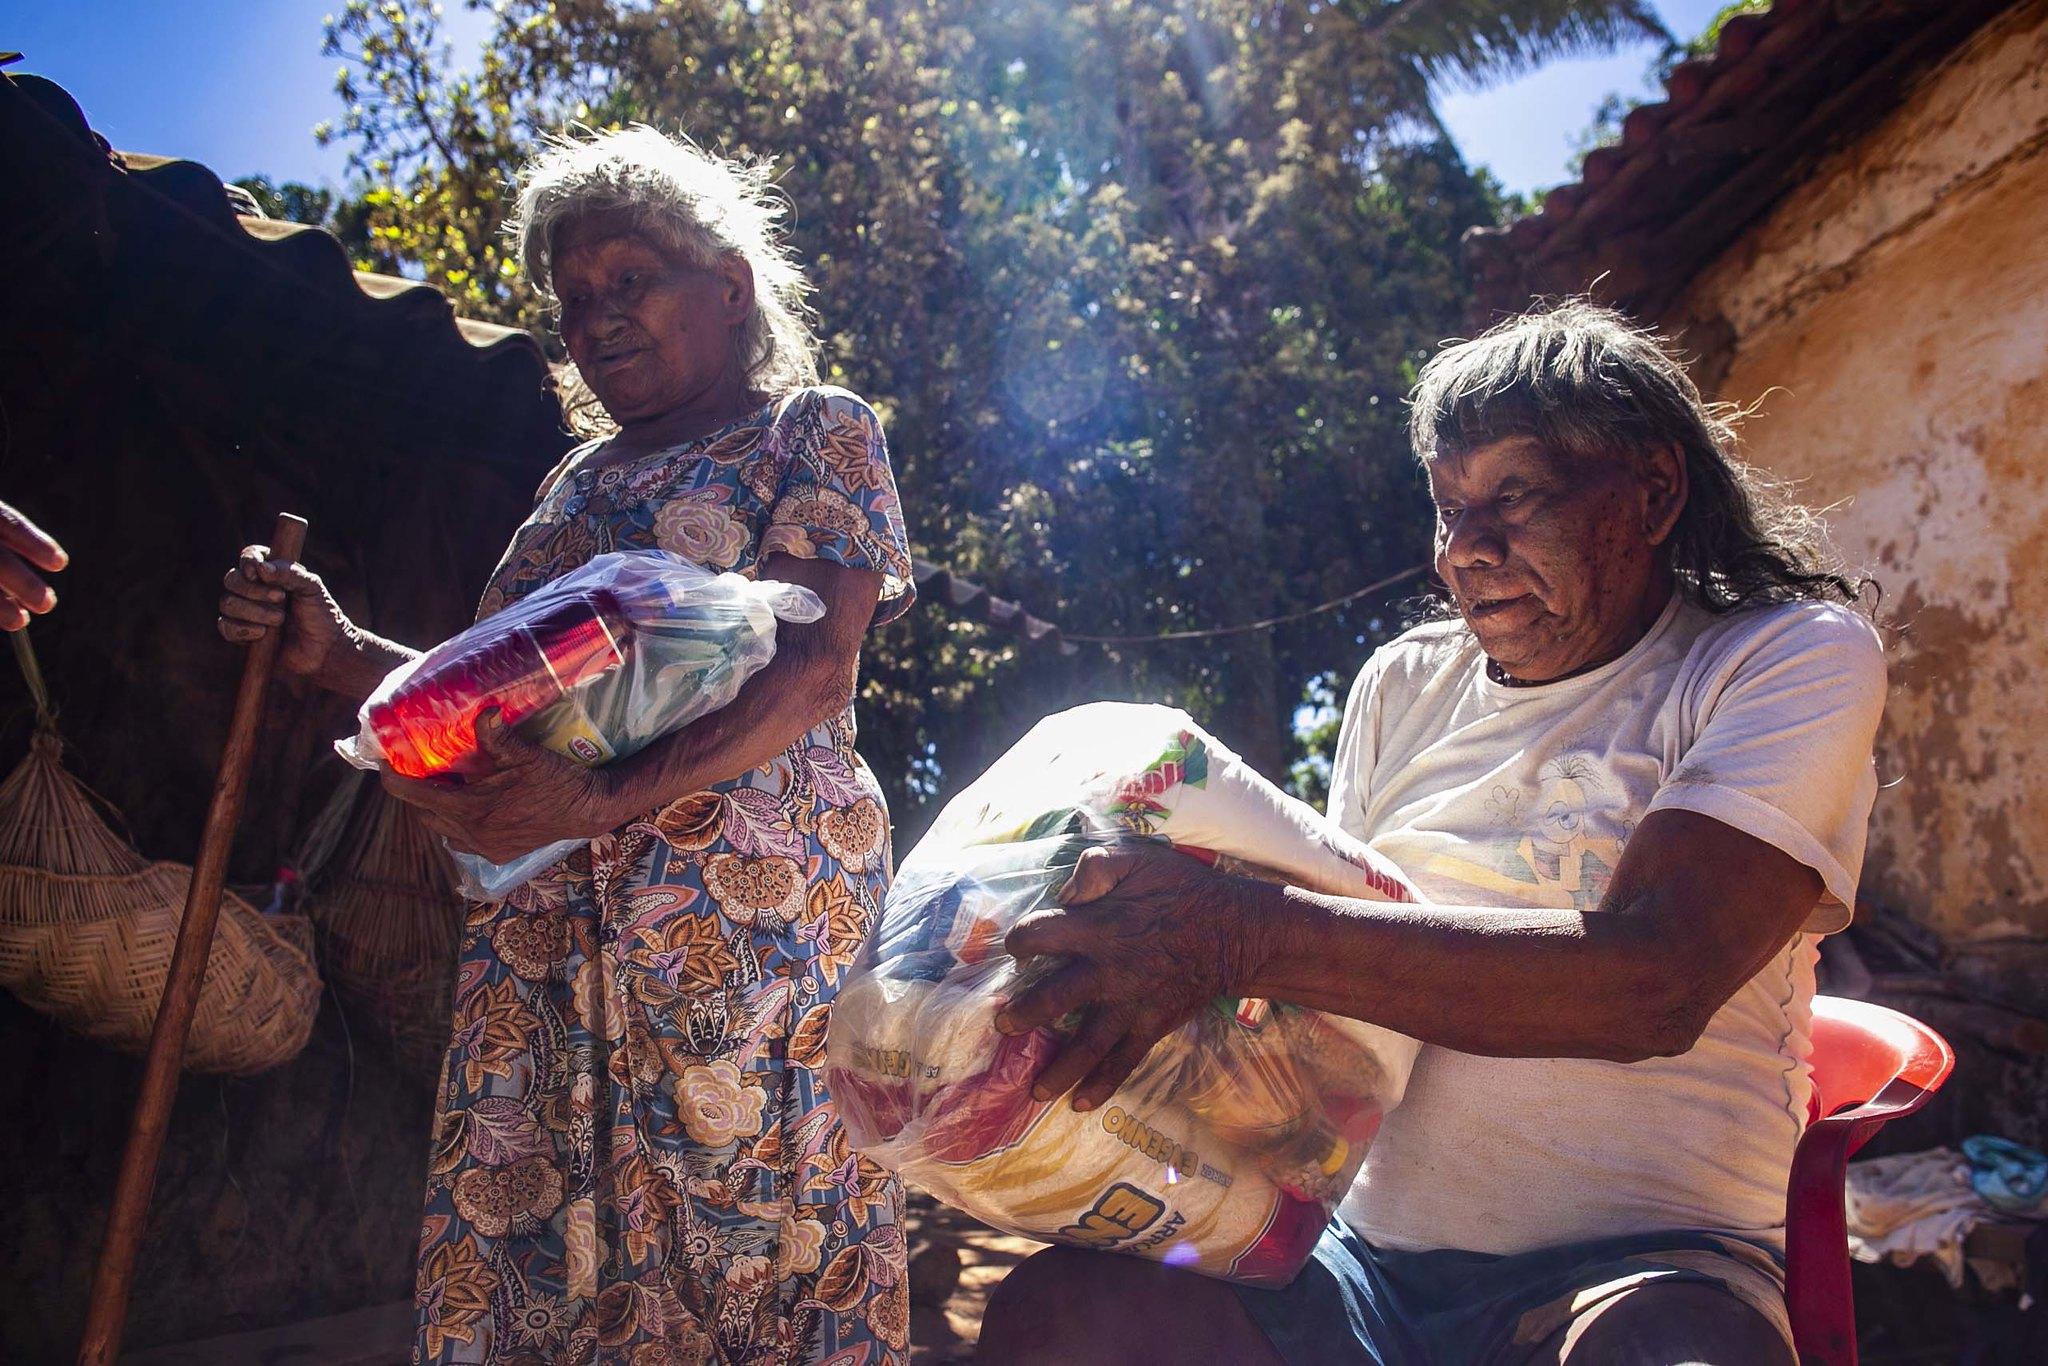 Governo Bolsonaro omitiu vulnerabilidade indígena na pandemia